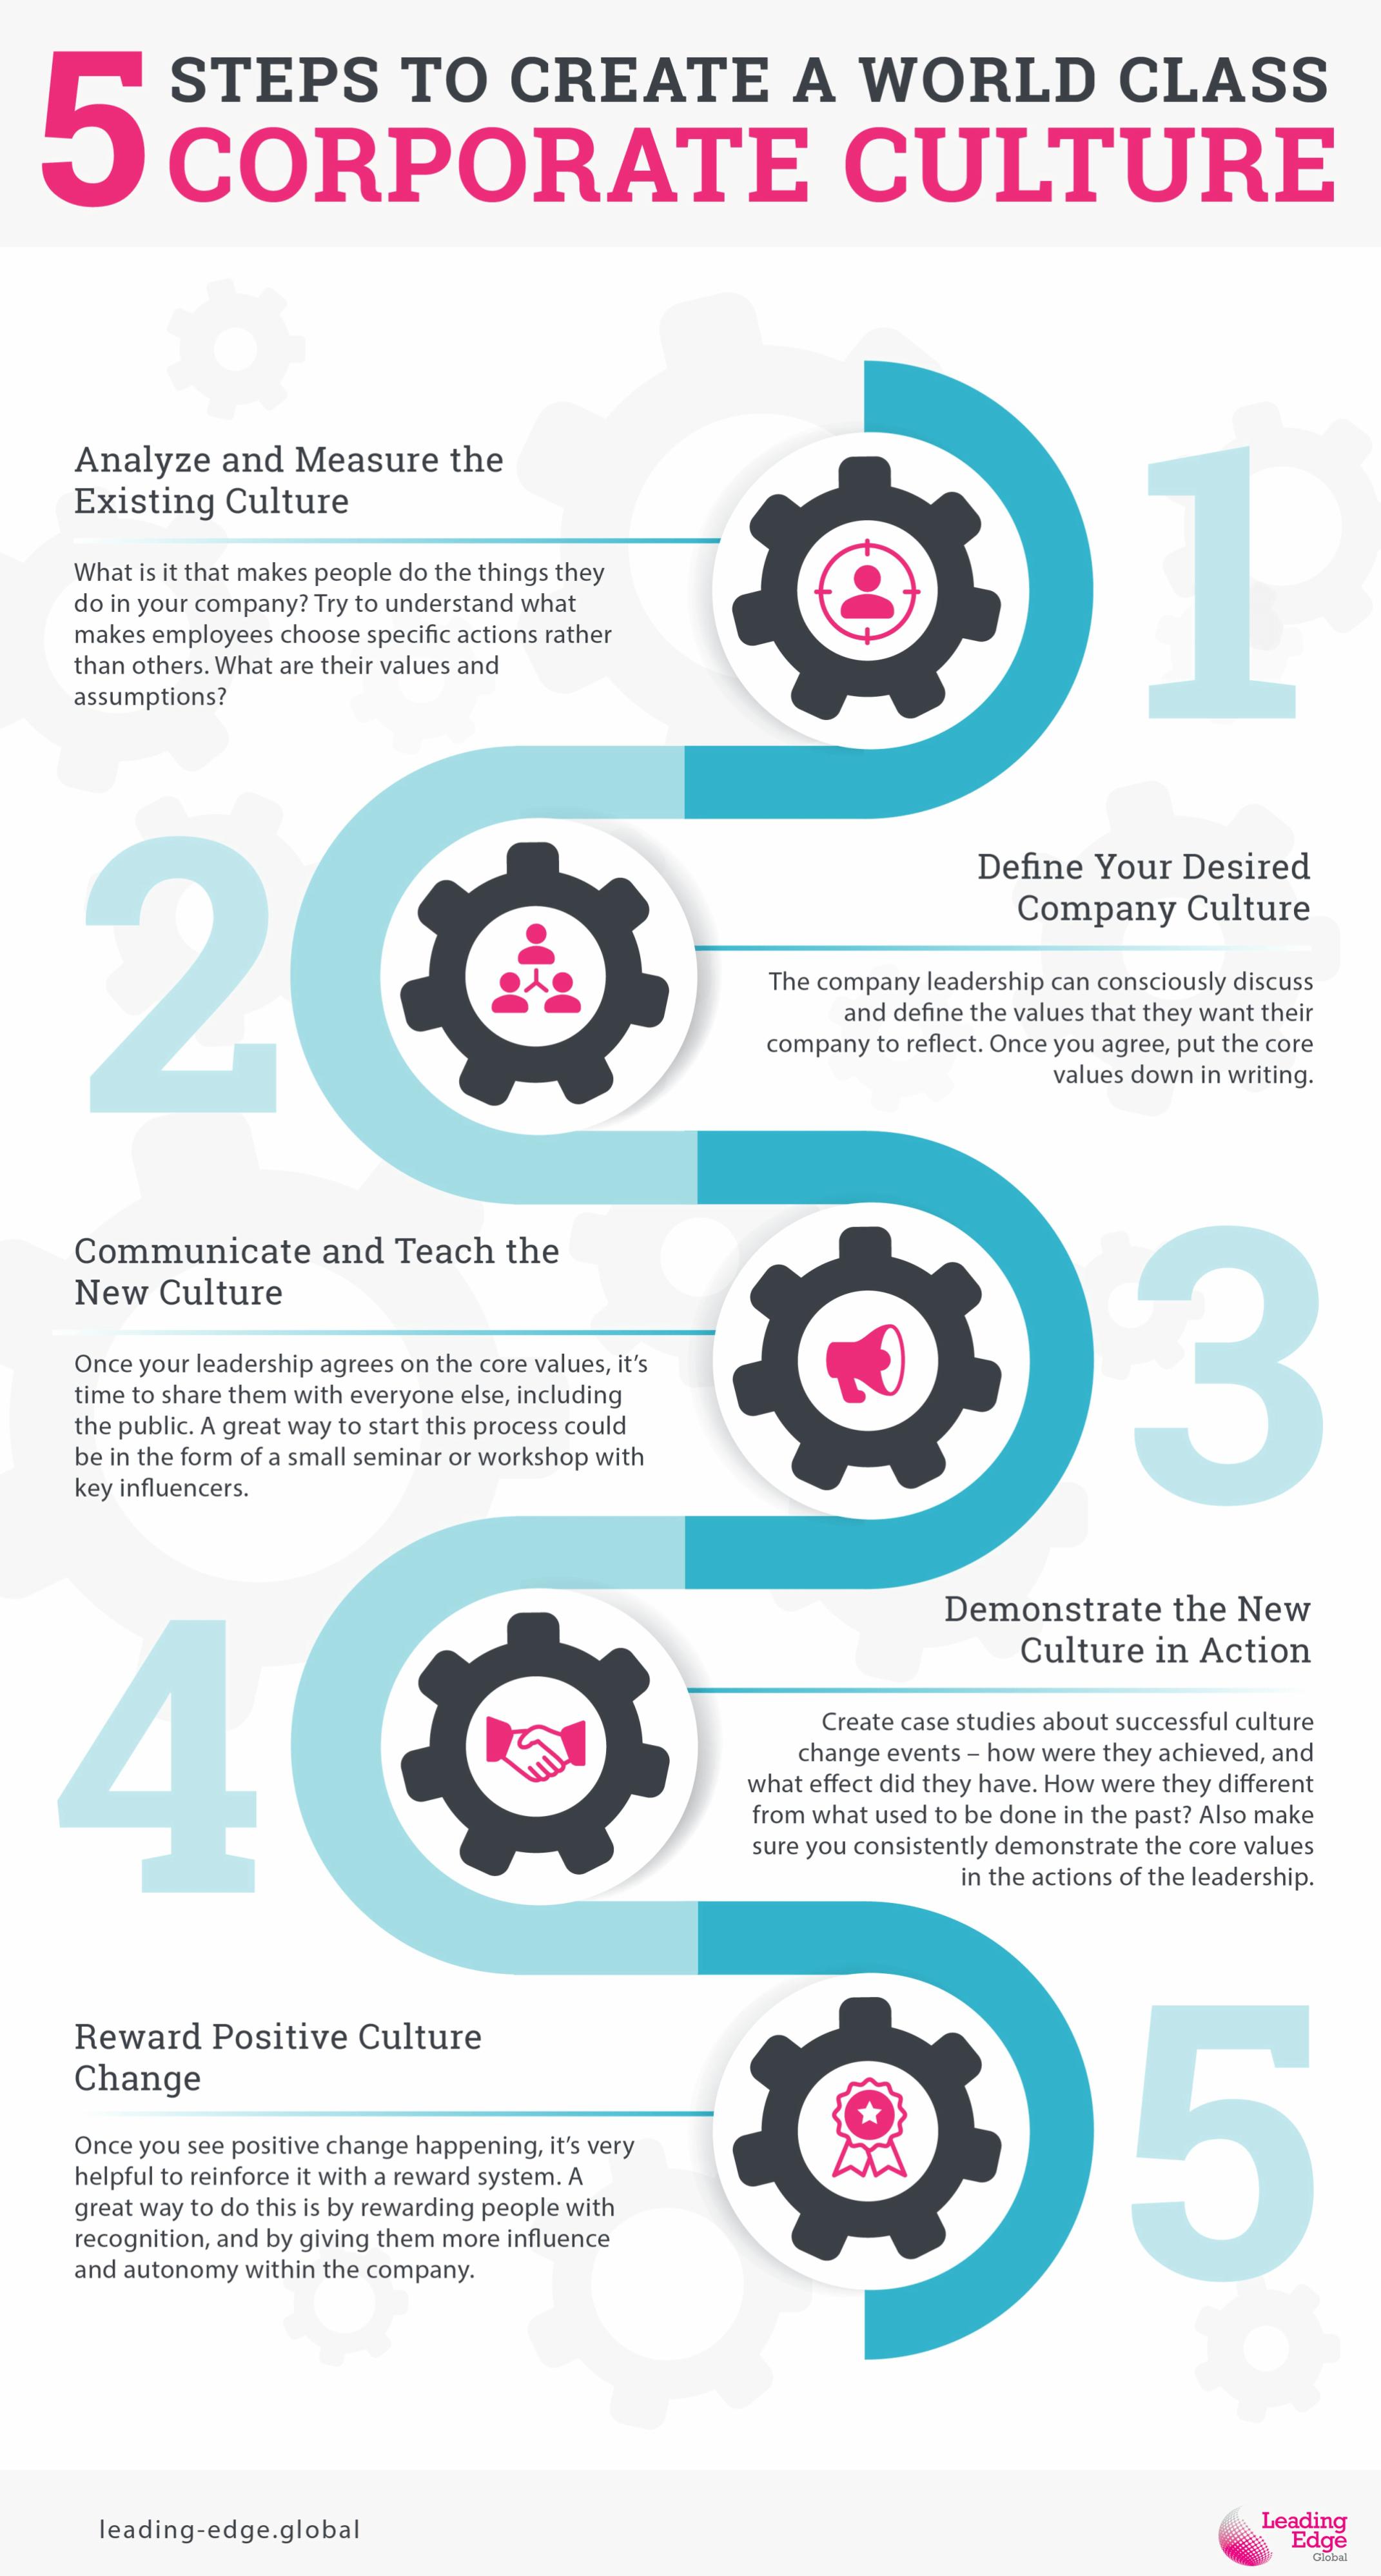 5-steps-corporate-culturev3.png